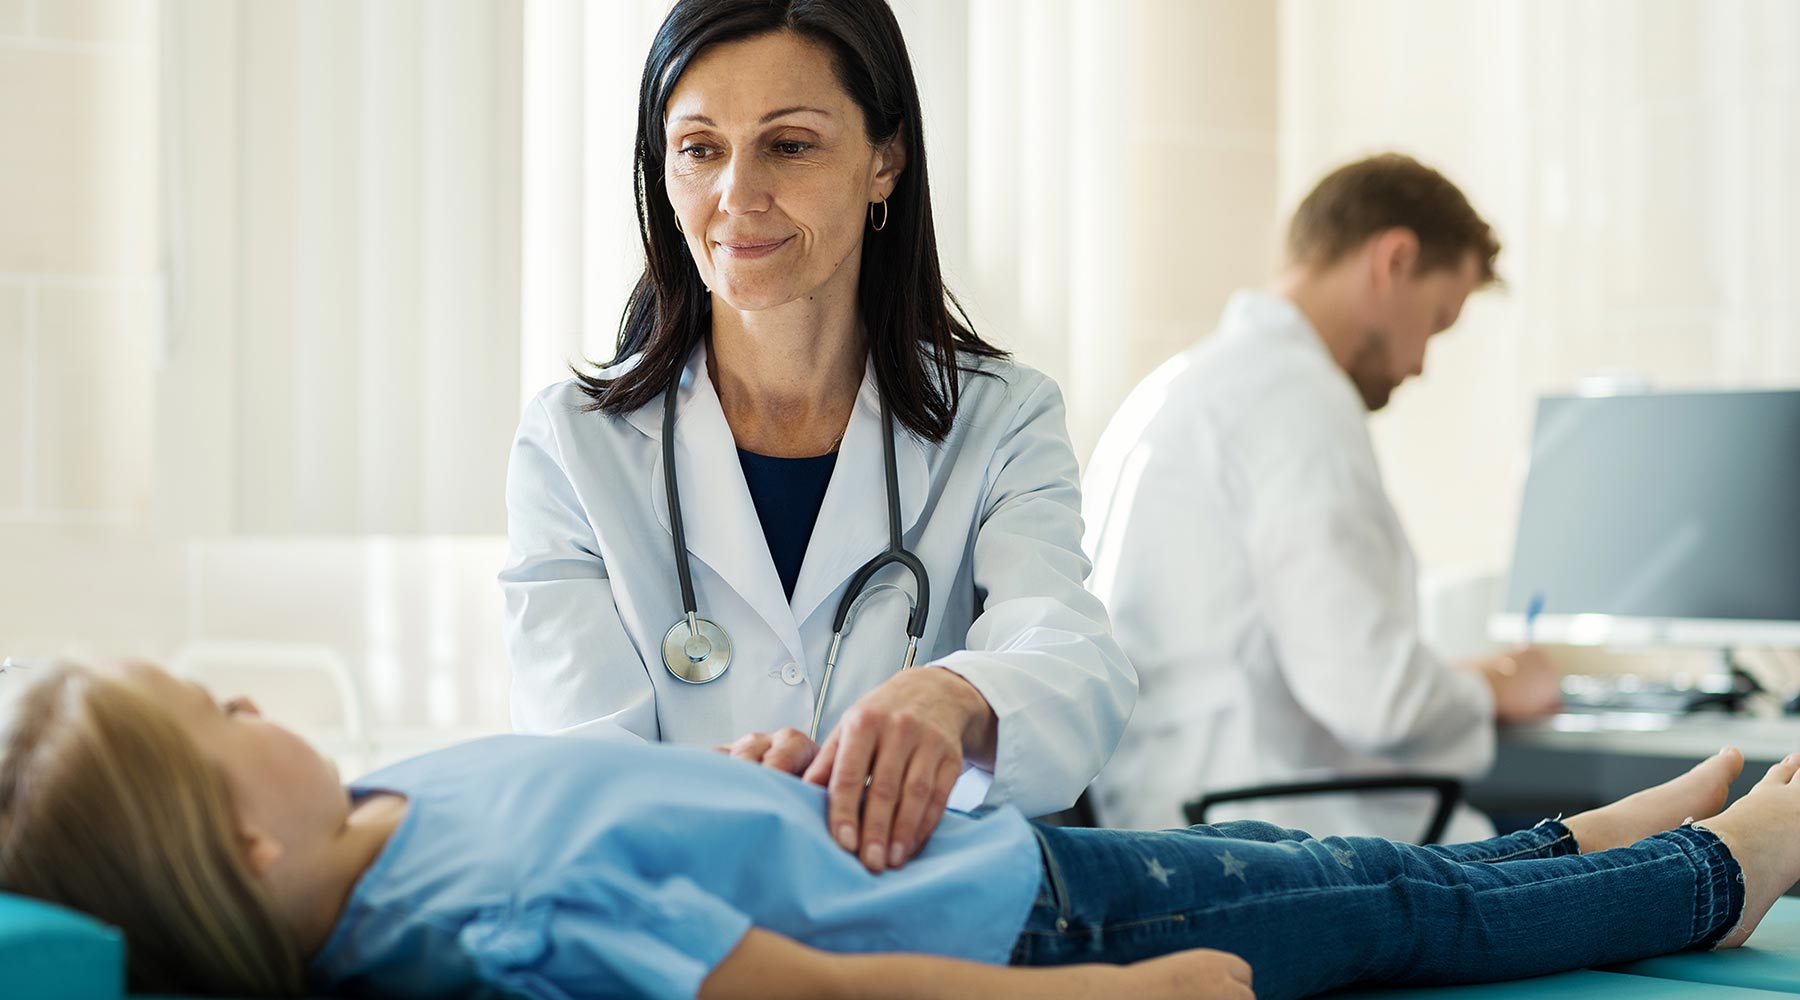 What Malpractice Risks Do GI Nurses Face?